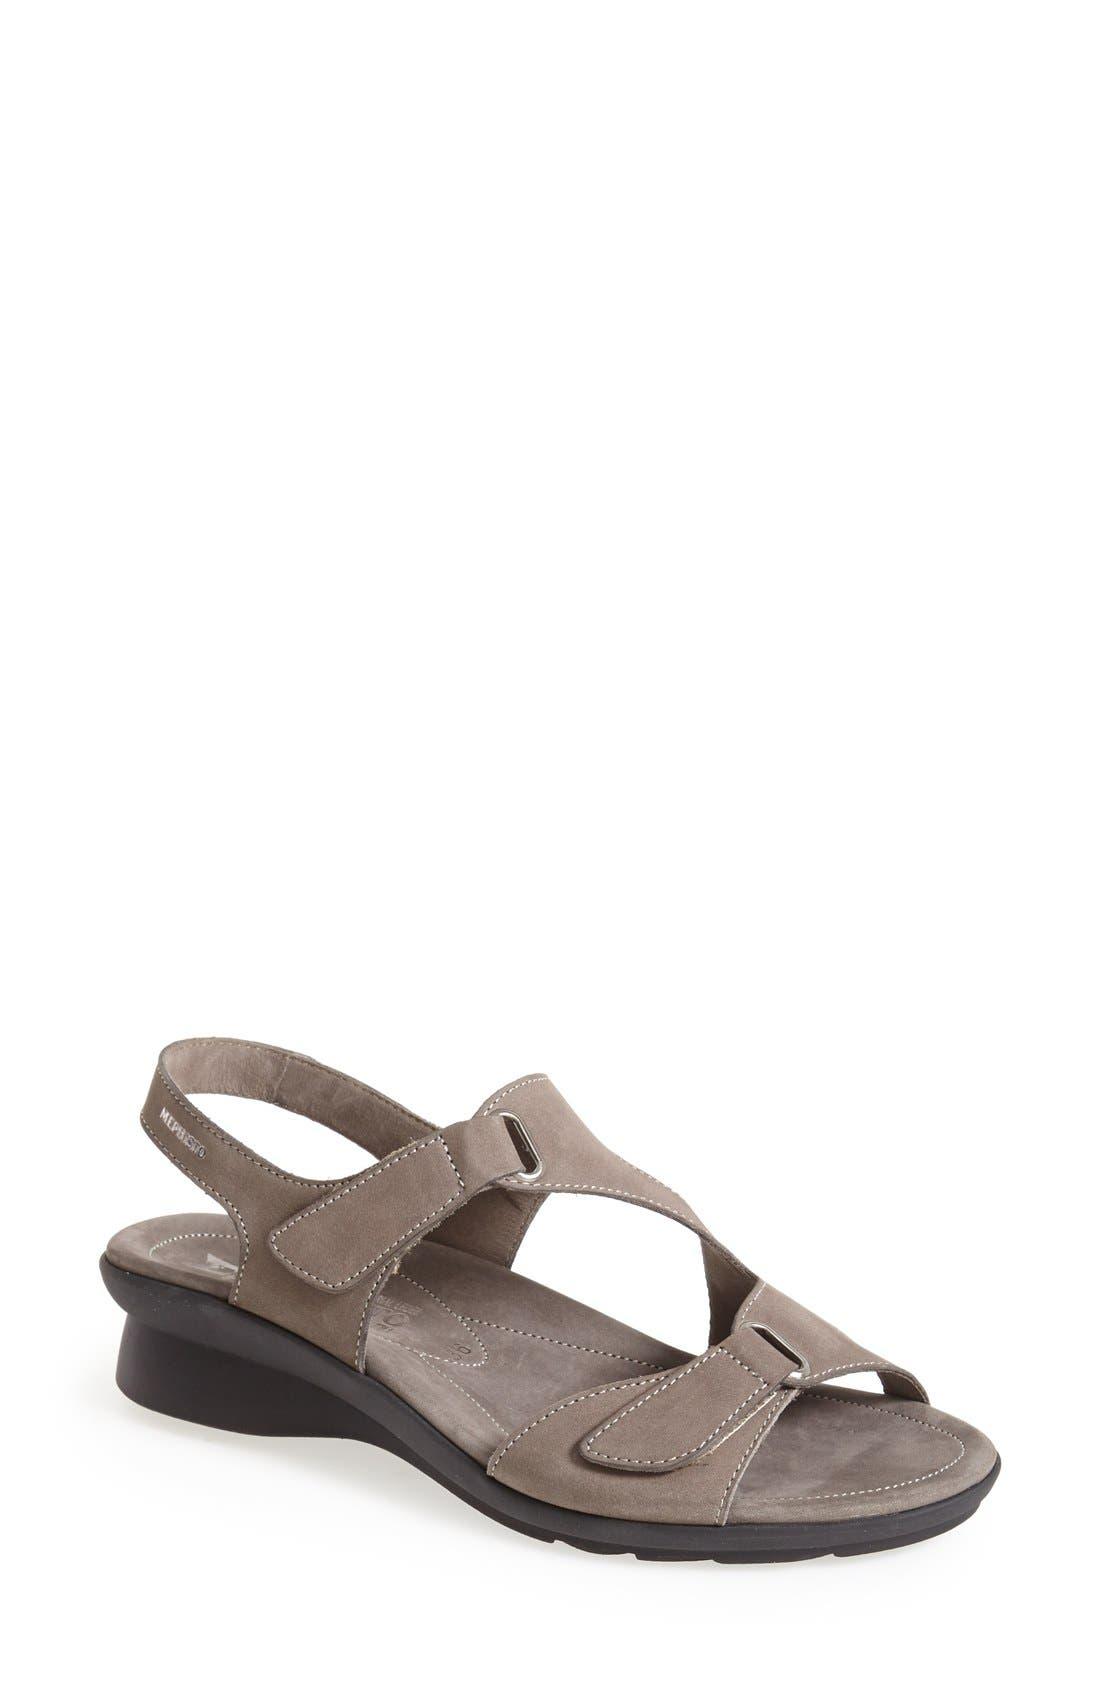 419efeb8a89 Mephisto 'Paris' Slingback Sandal